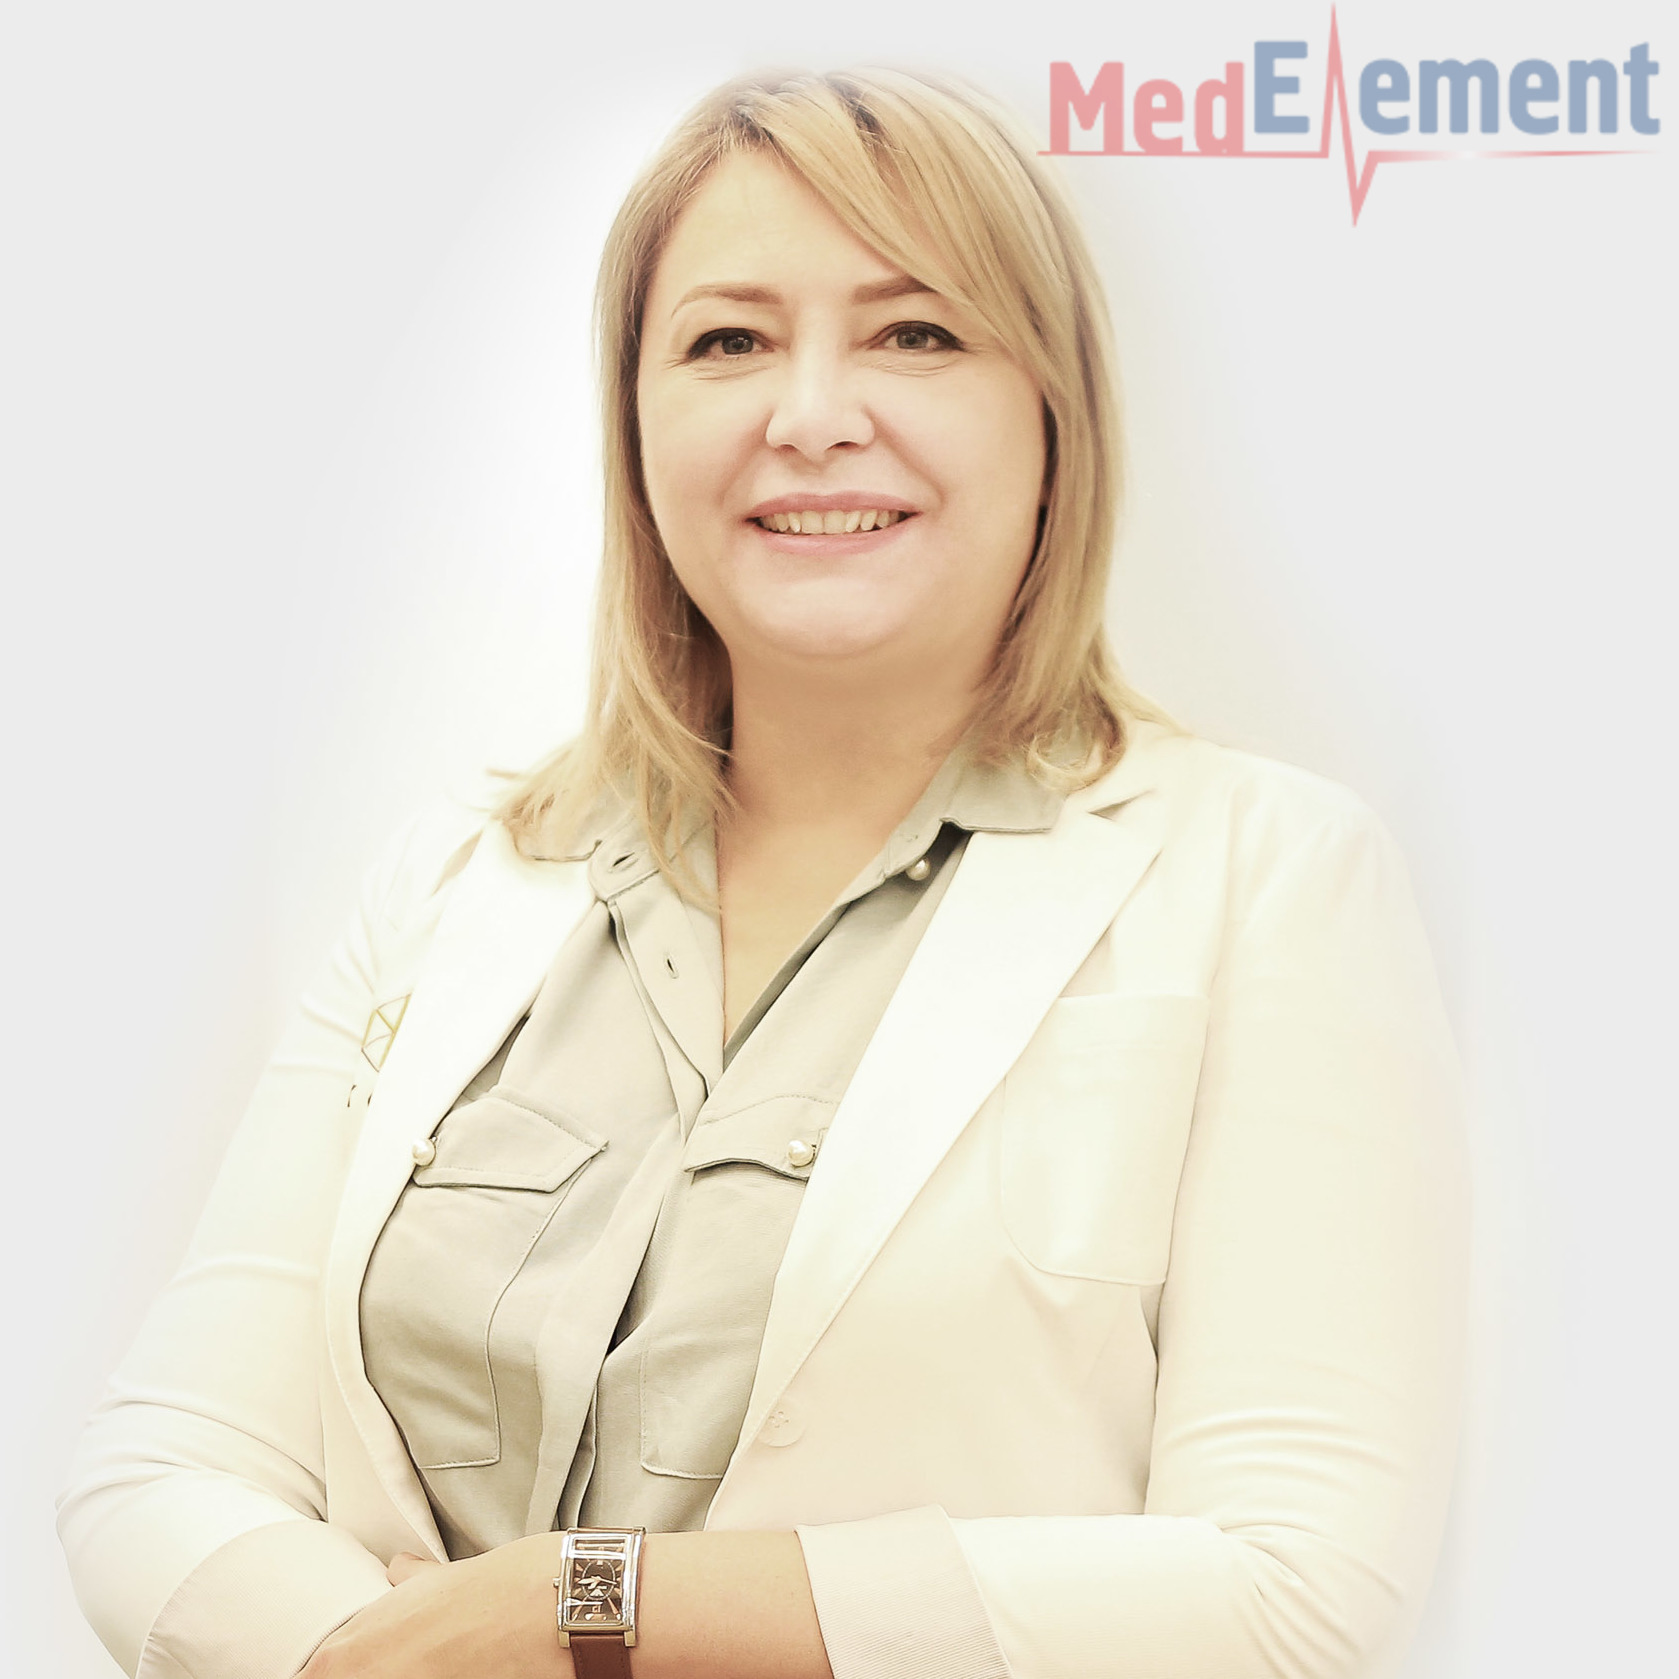 Леонтьева Оксана Геннадьевна